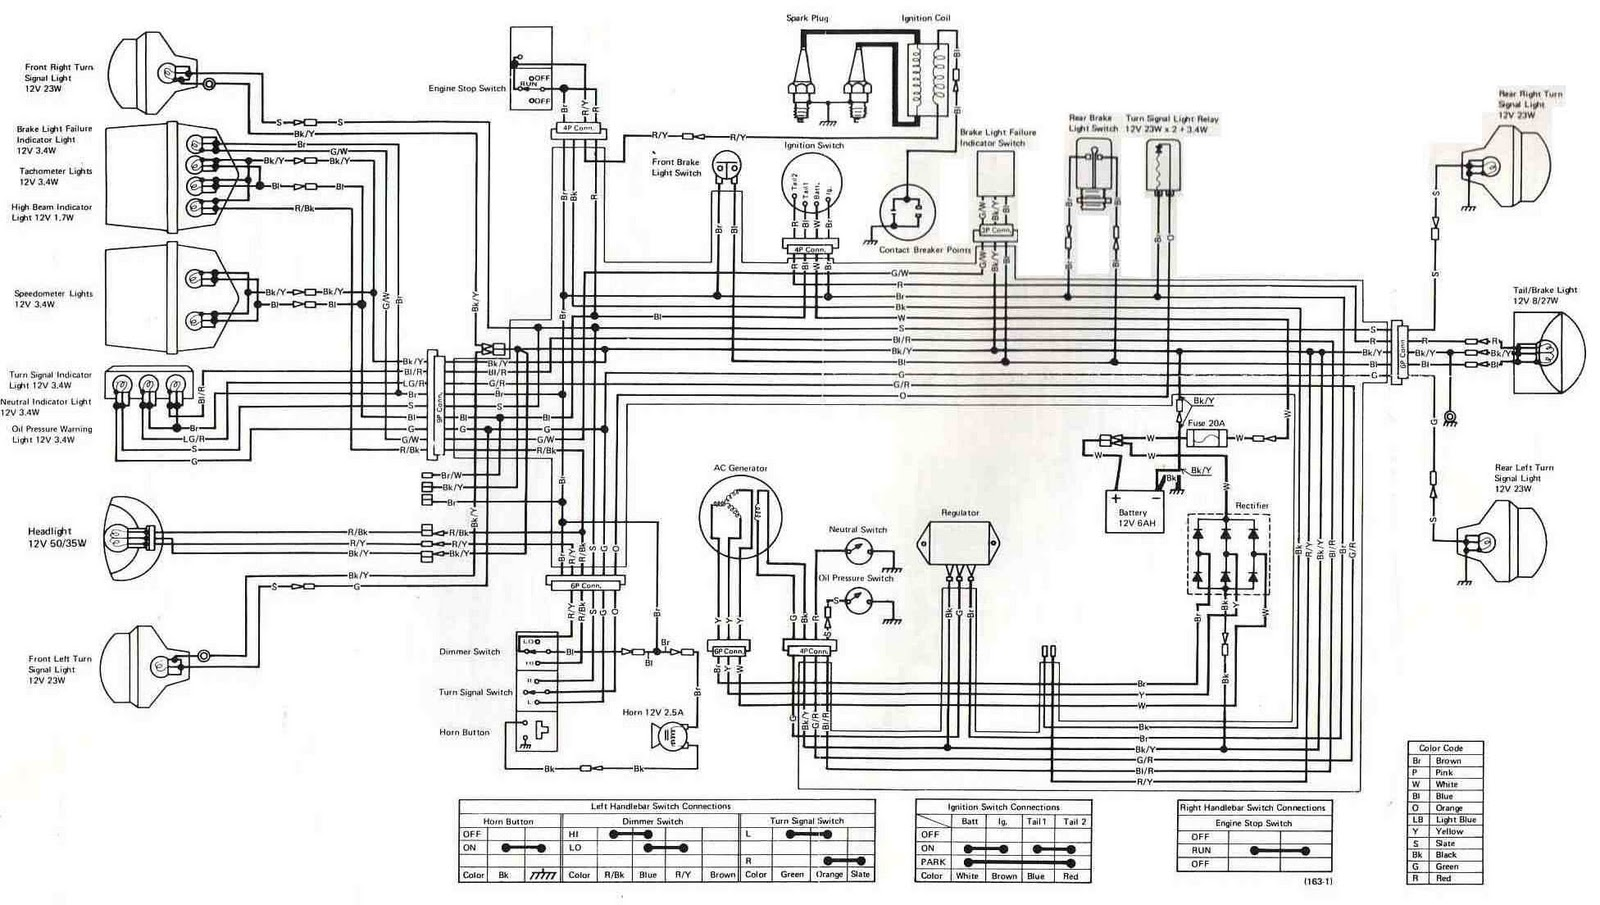 DIAGRAM] 2012 Kawasaki Vn900 Wiring Diagram FULL Version HD Quality Wiring  Diagram - VORONOYDIAGRAM.MAGNETIKITALIA.IT Magnetik Italia srl